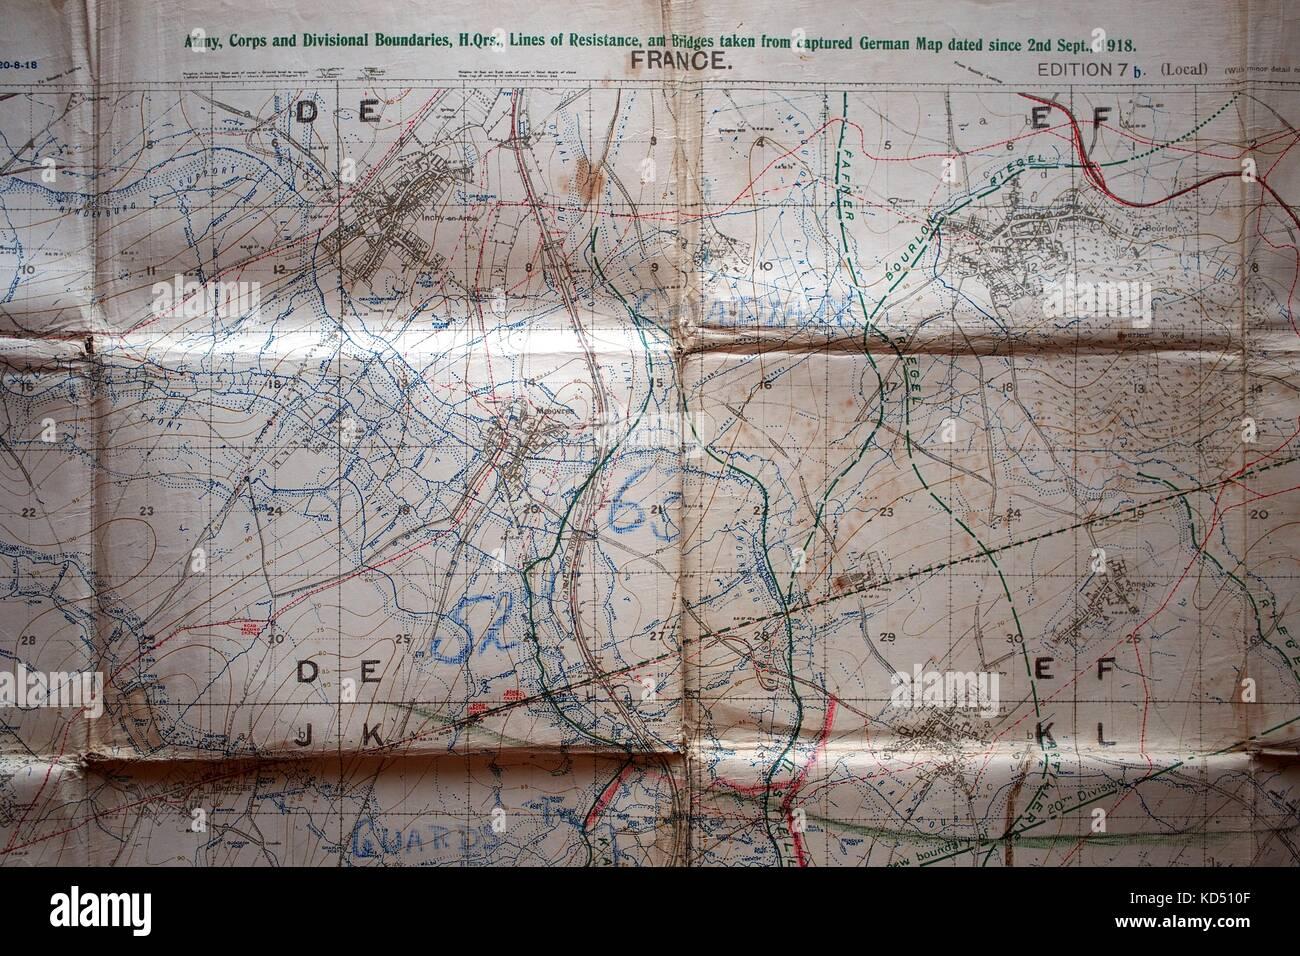 Detail of ordnance survey first world war map circa 1918 cambrai detail of ordnance survey first world war map circa 1918 cambrai france army corps and divisional boundaries gumiabroncs Images